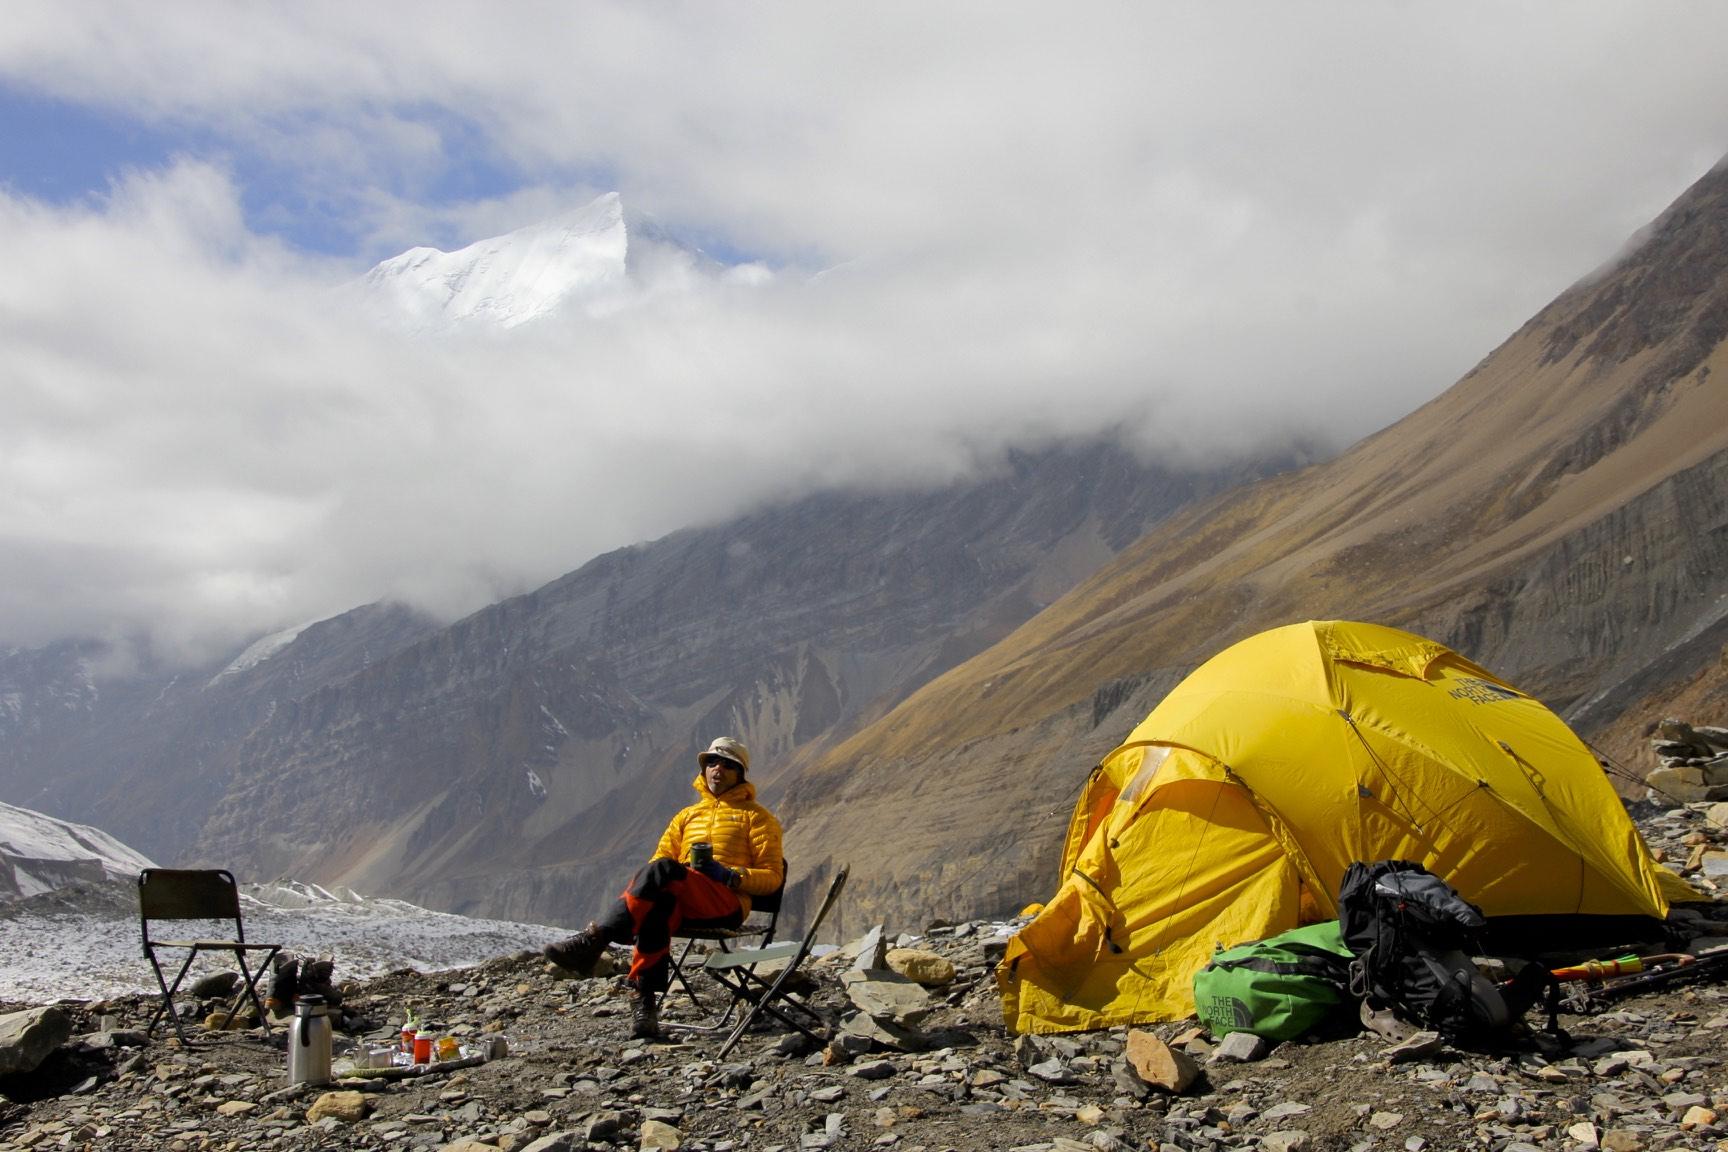 Dhaulagiri BC proper. The summit in the clouds is Dhaulagiri II.